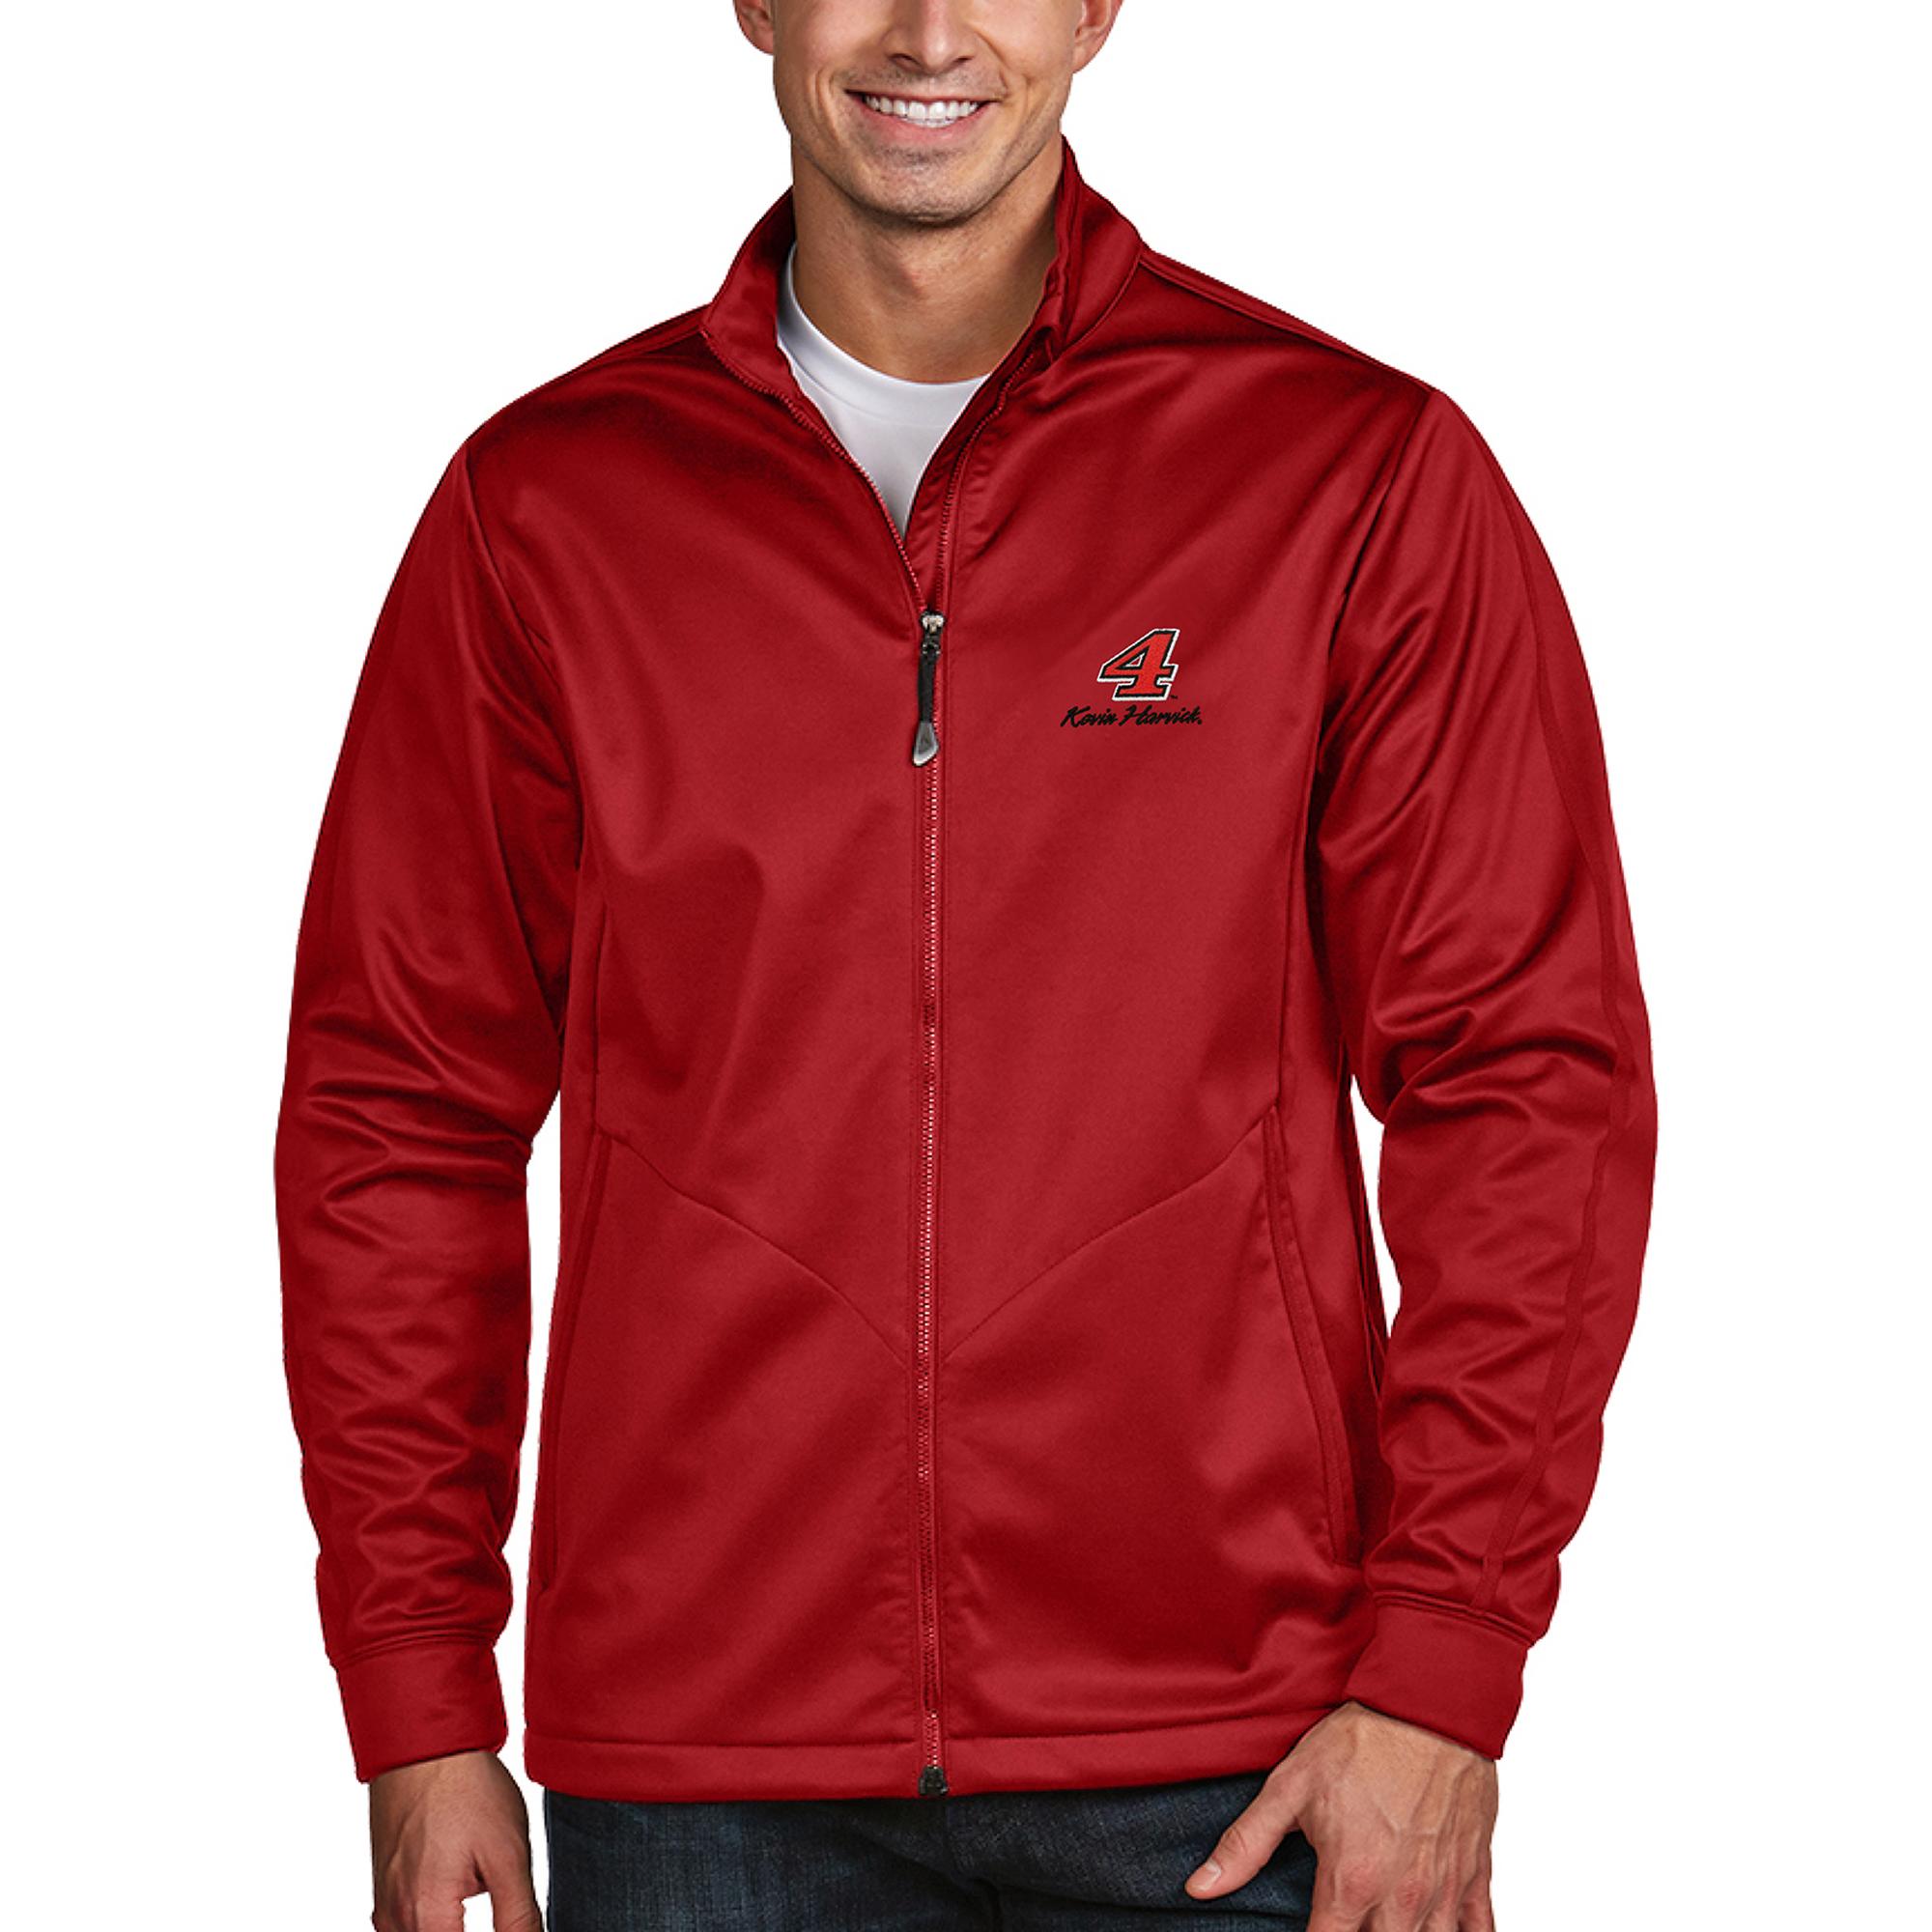 Kevin Harvick Antigua Golf Full-Zip Jacket - Red